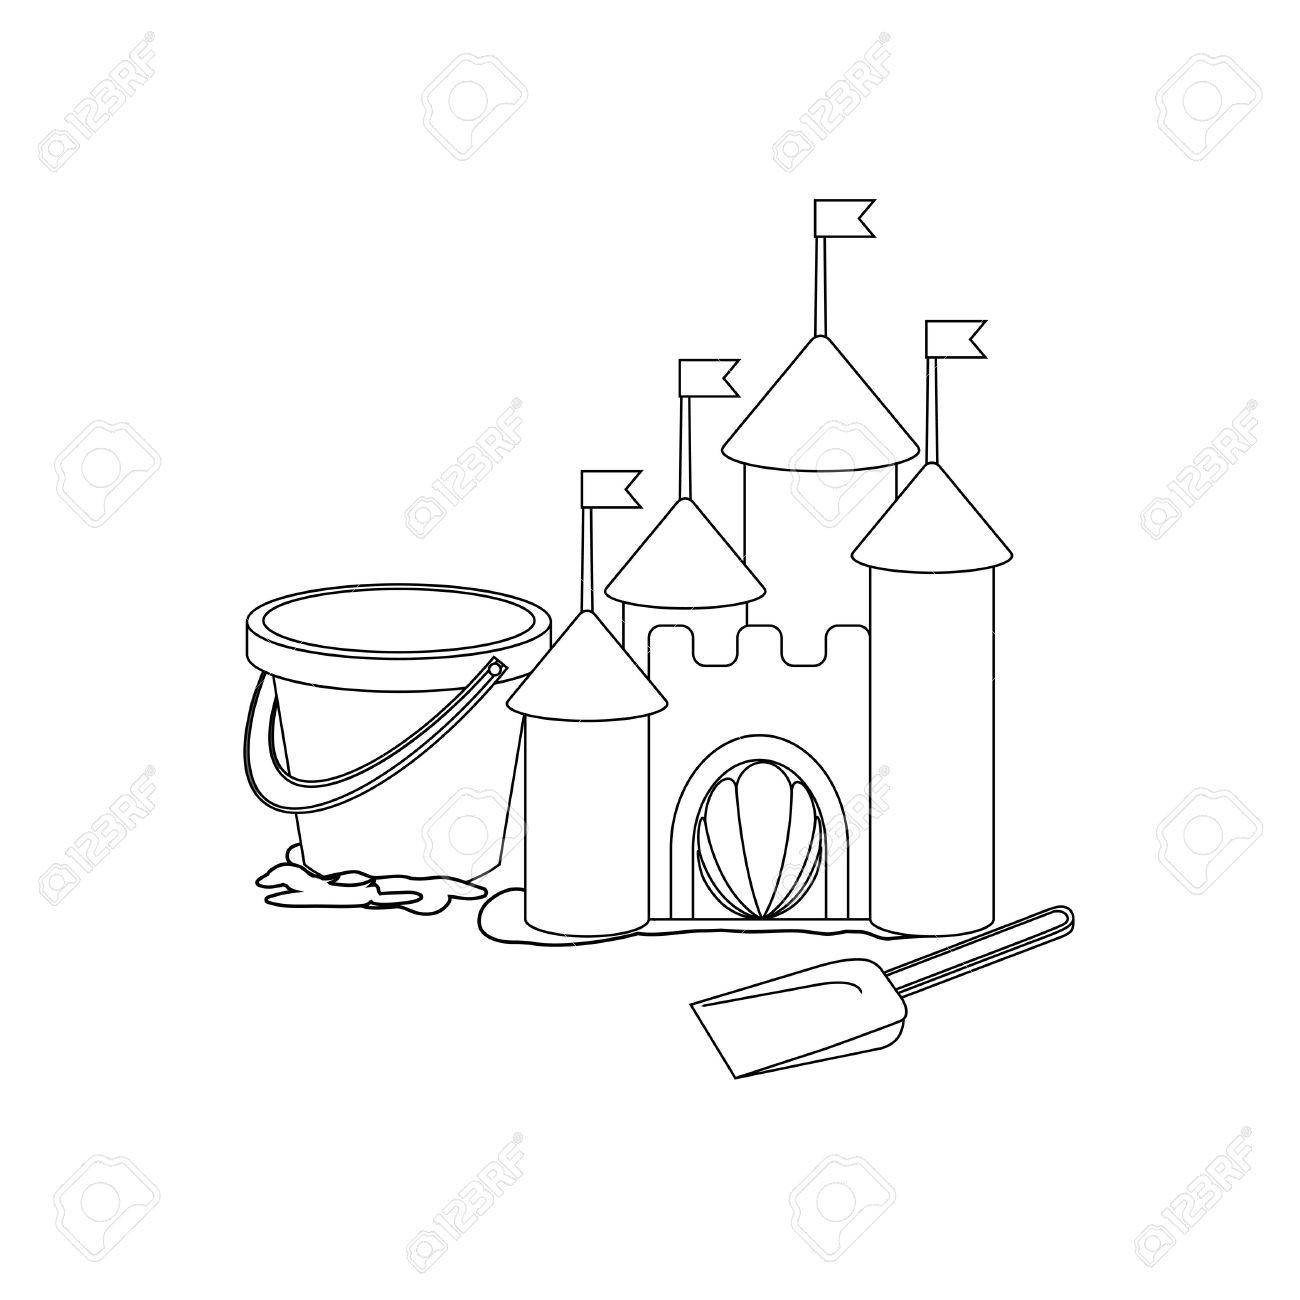 Coloring Book: Cartoon Sand Castle Royalty Free Cliparts, Vectors ...